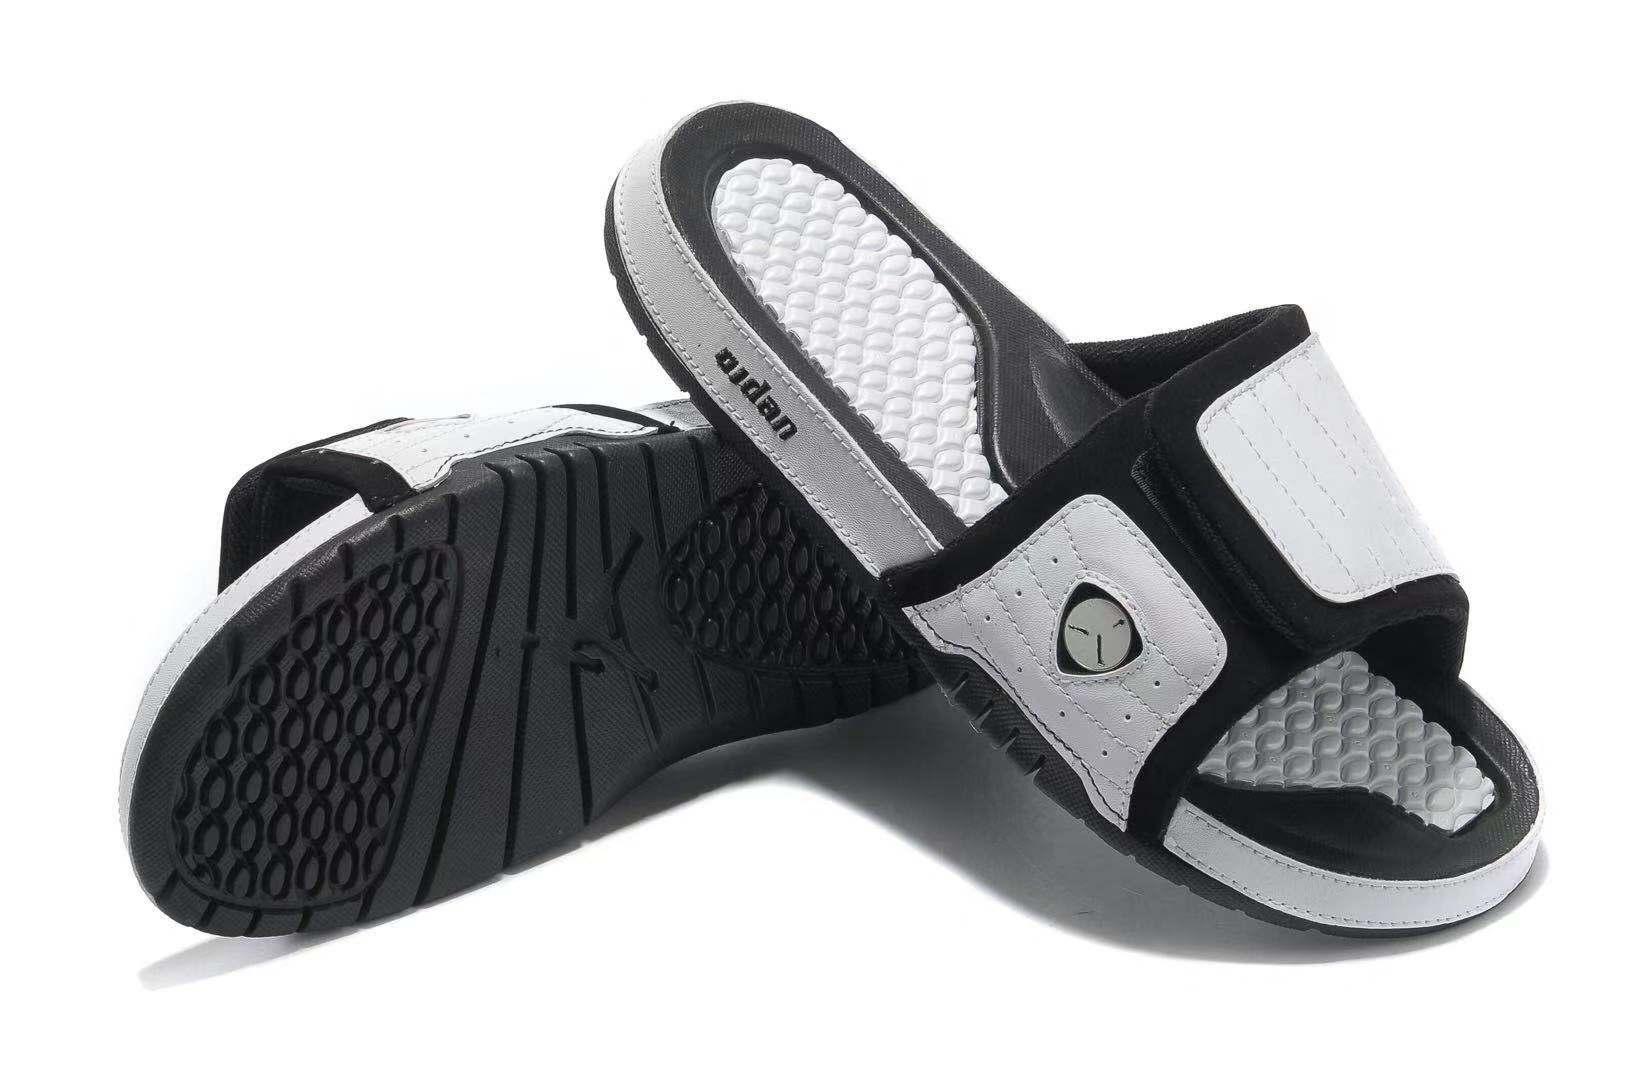 d1fb60e41729a Designer Slippers New Brand Letter Luxury Slides Men 2018 Rubber Sandals  Beach Slide Fashion Scuffs Slippers Indoor Shoes Size Eur 40 45 Clogs For  Women ...